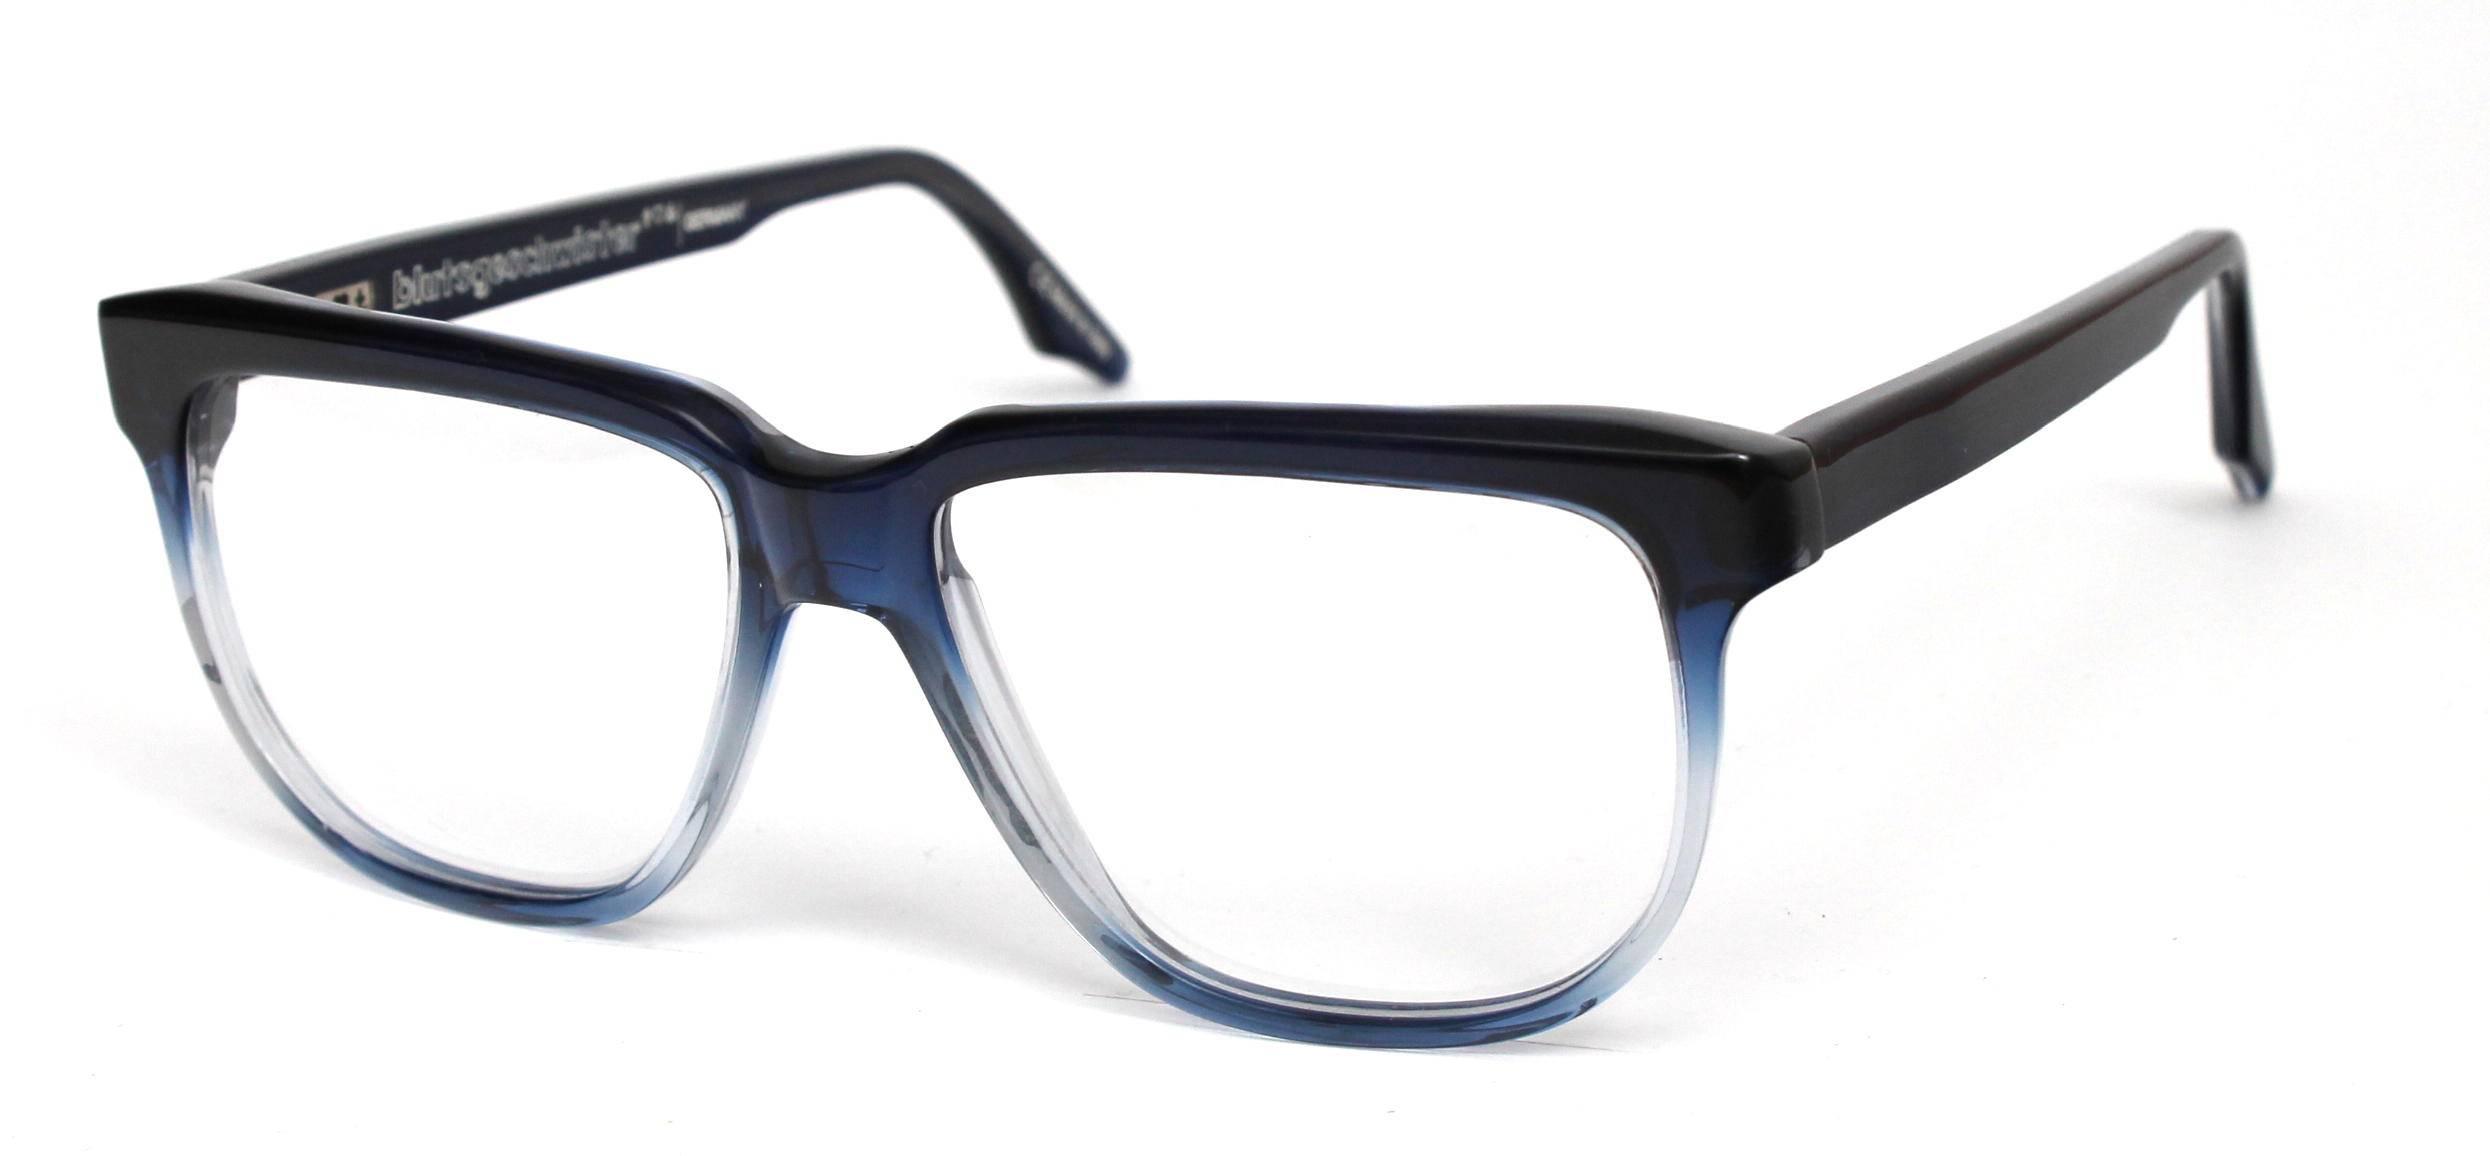 Wonderglasses - Private Eye 992